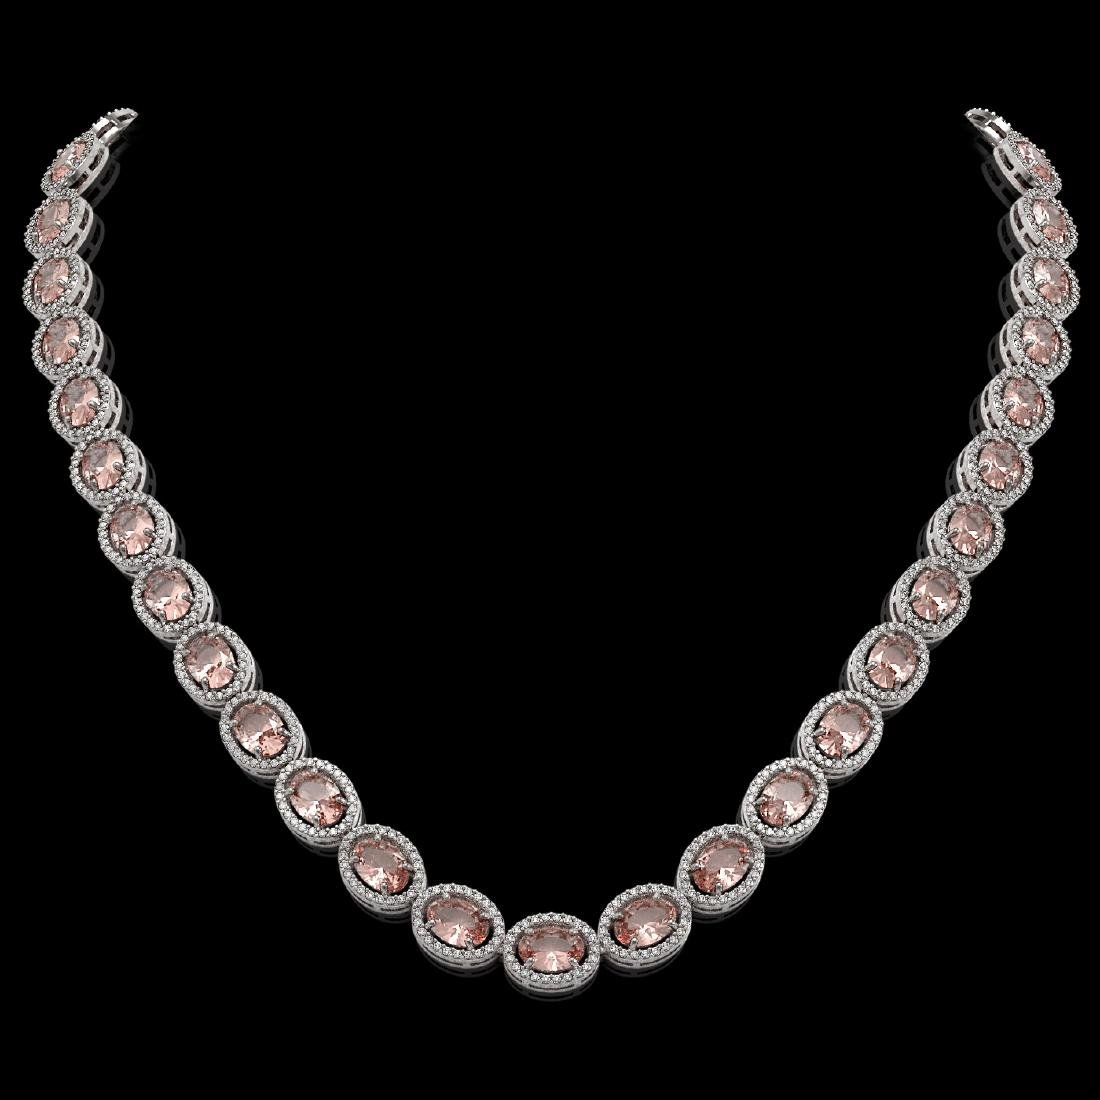 45.98 CTW Morganite & Diamond Halo Necklace 10K White